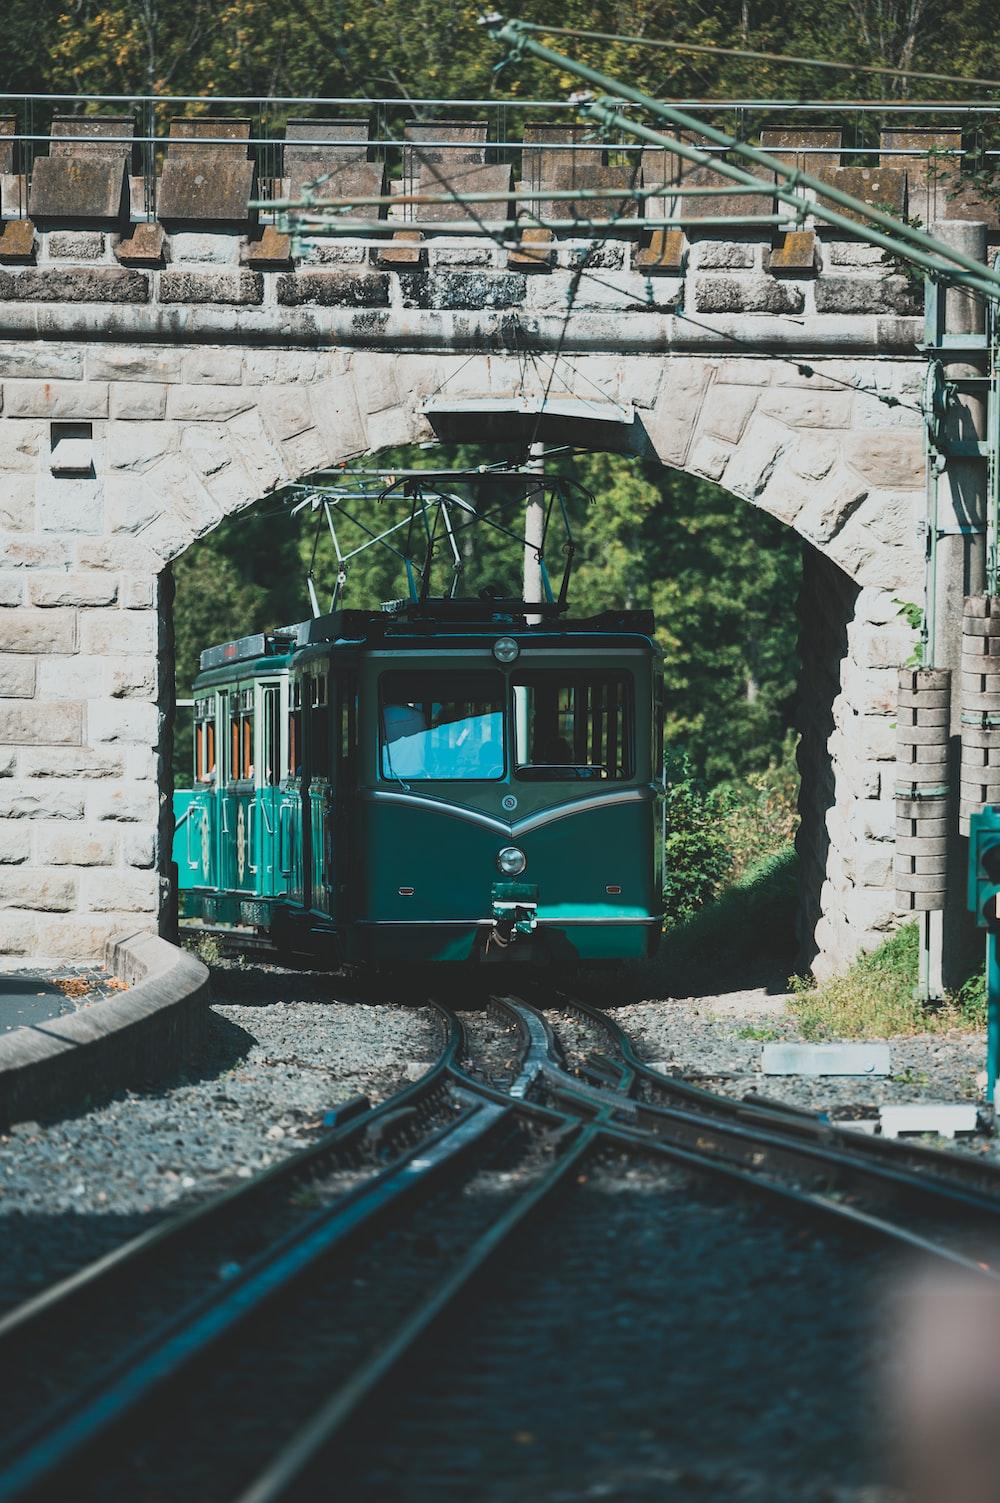 green train on rail tracks